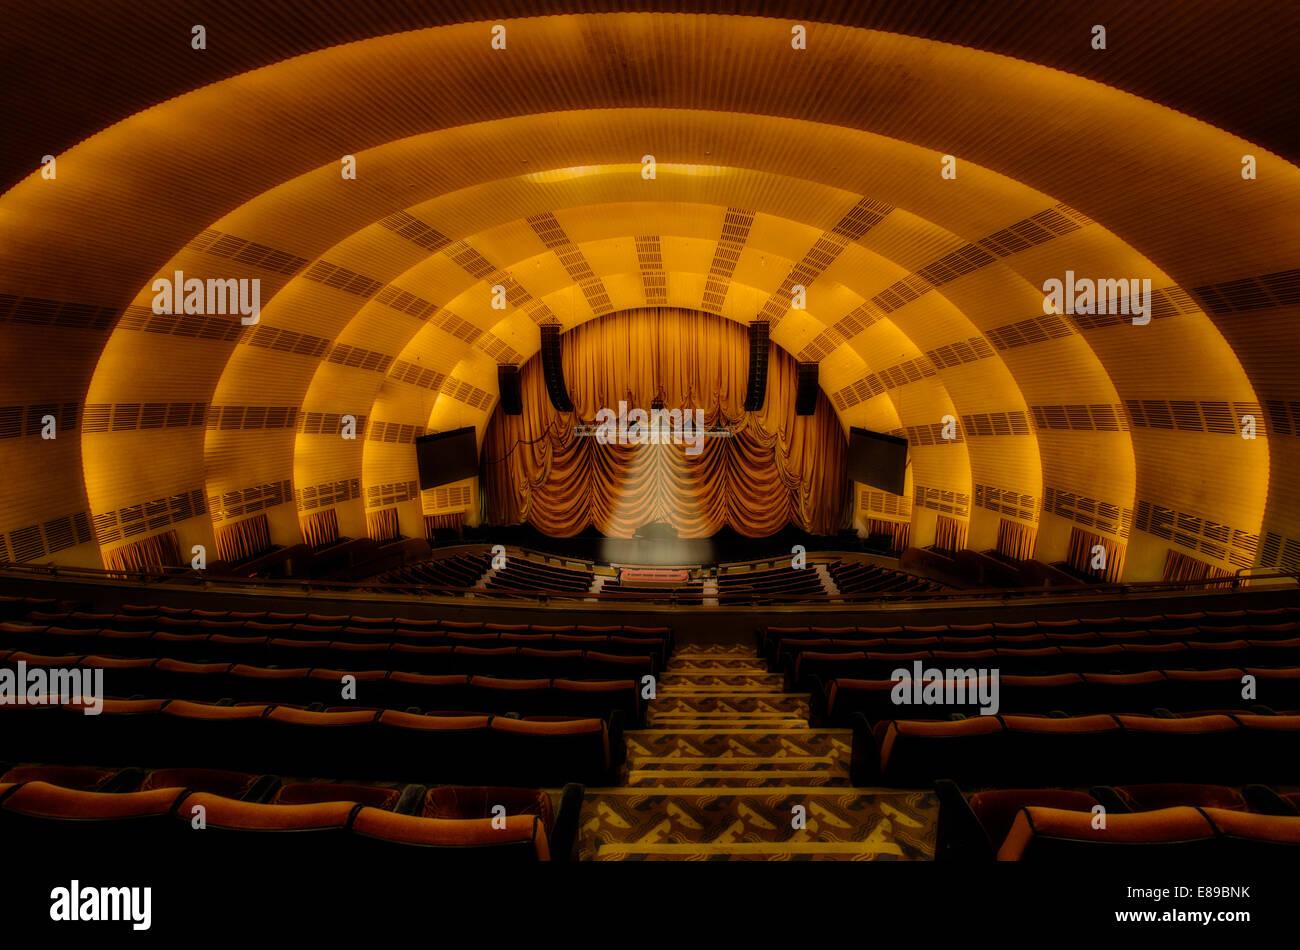 The Iconic interior of Radio City Music Hall theater in midtown Manhattan New York City. - Stock Image